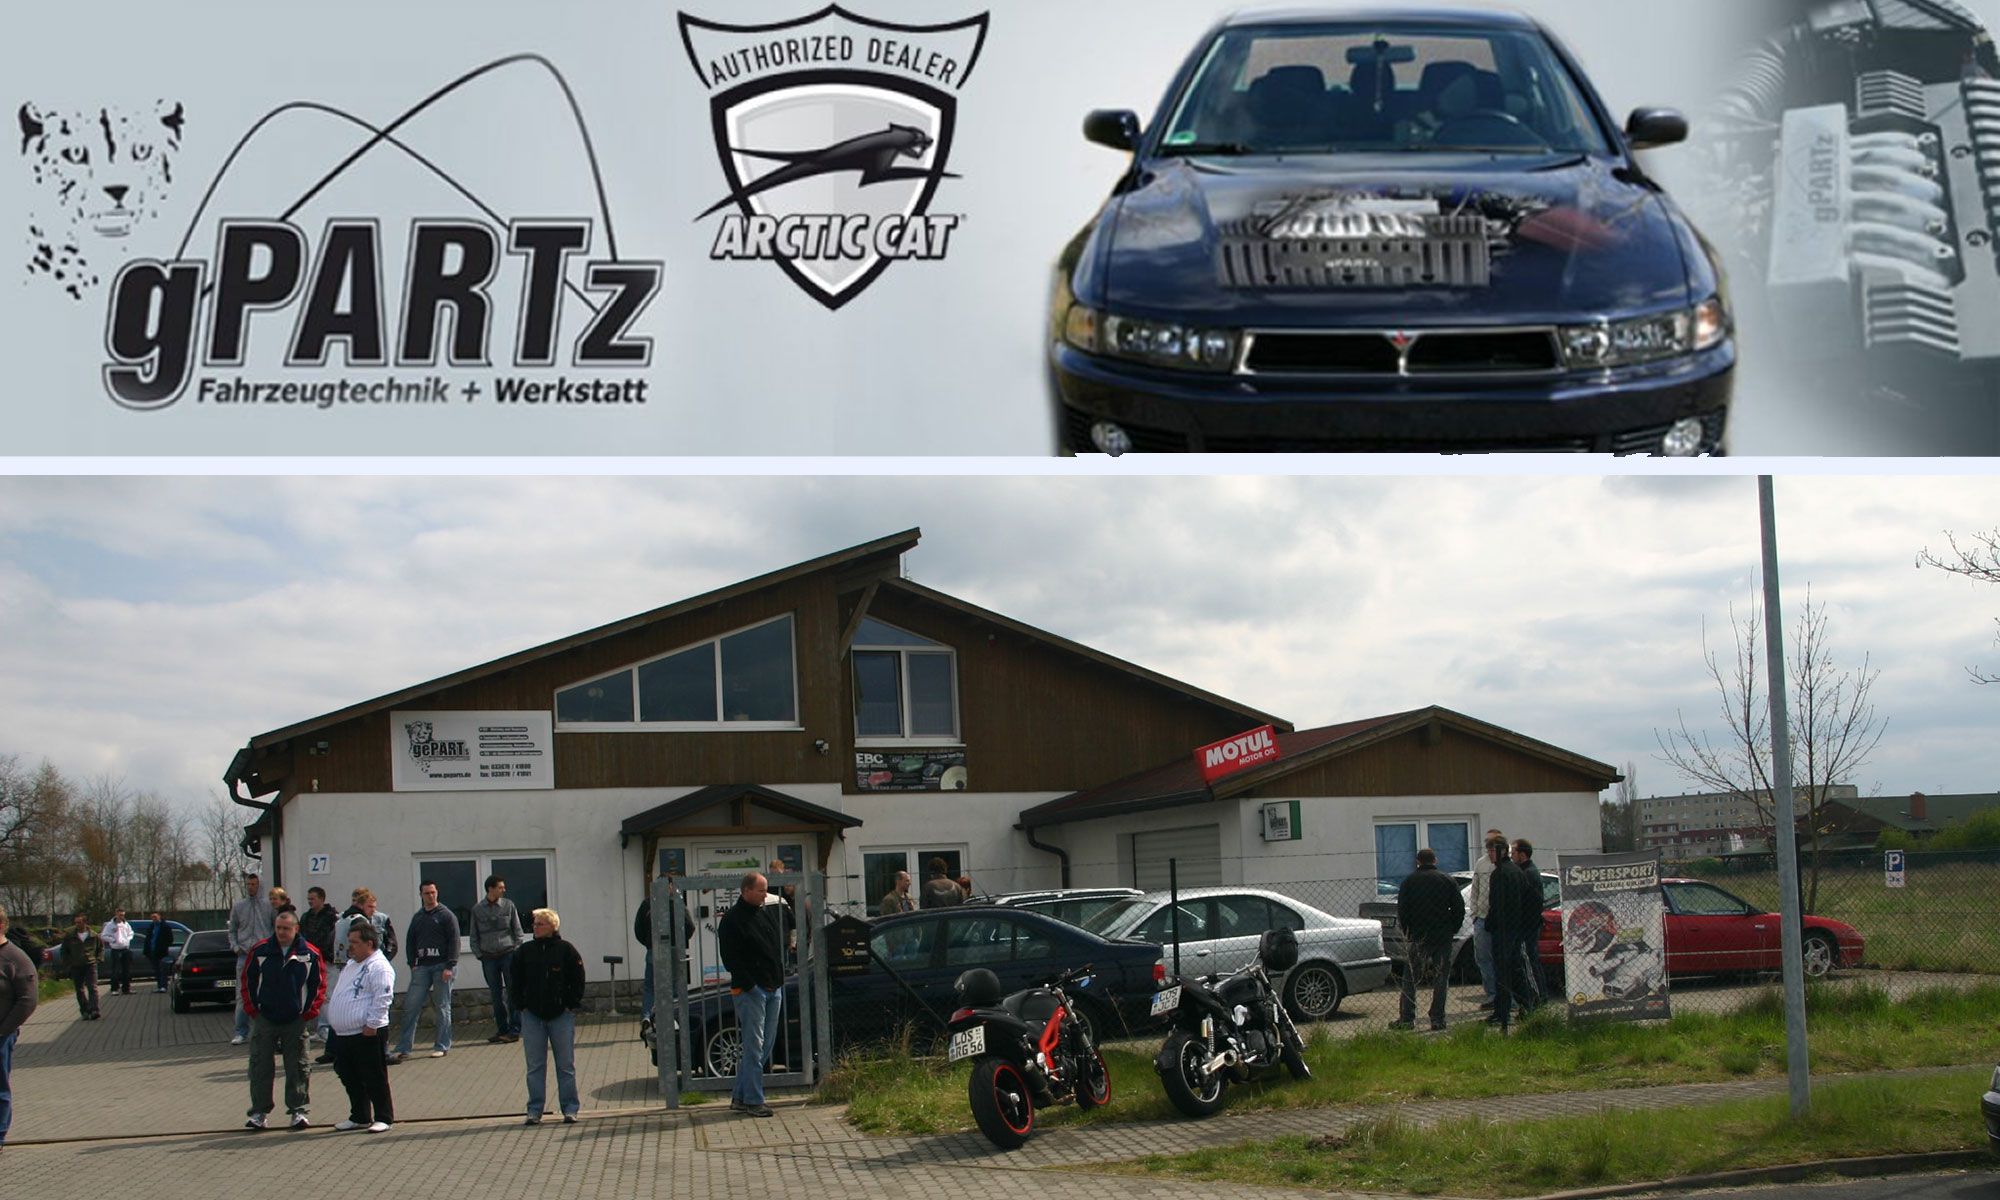 gPARTz - Fahrzeugtechnik + Werkstatt